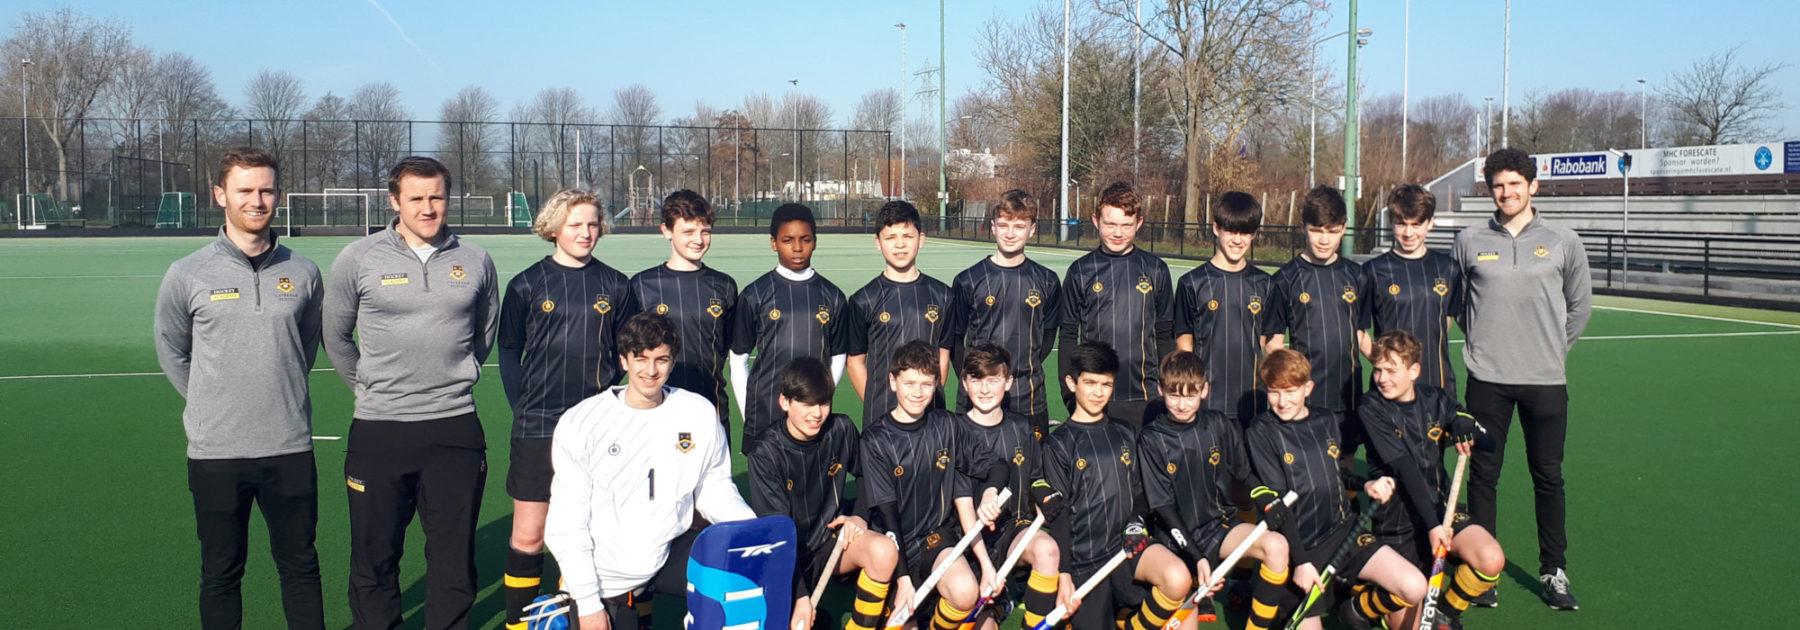 U14 Holland Hockey Tour